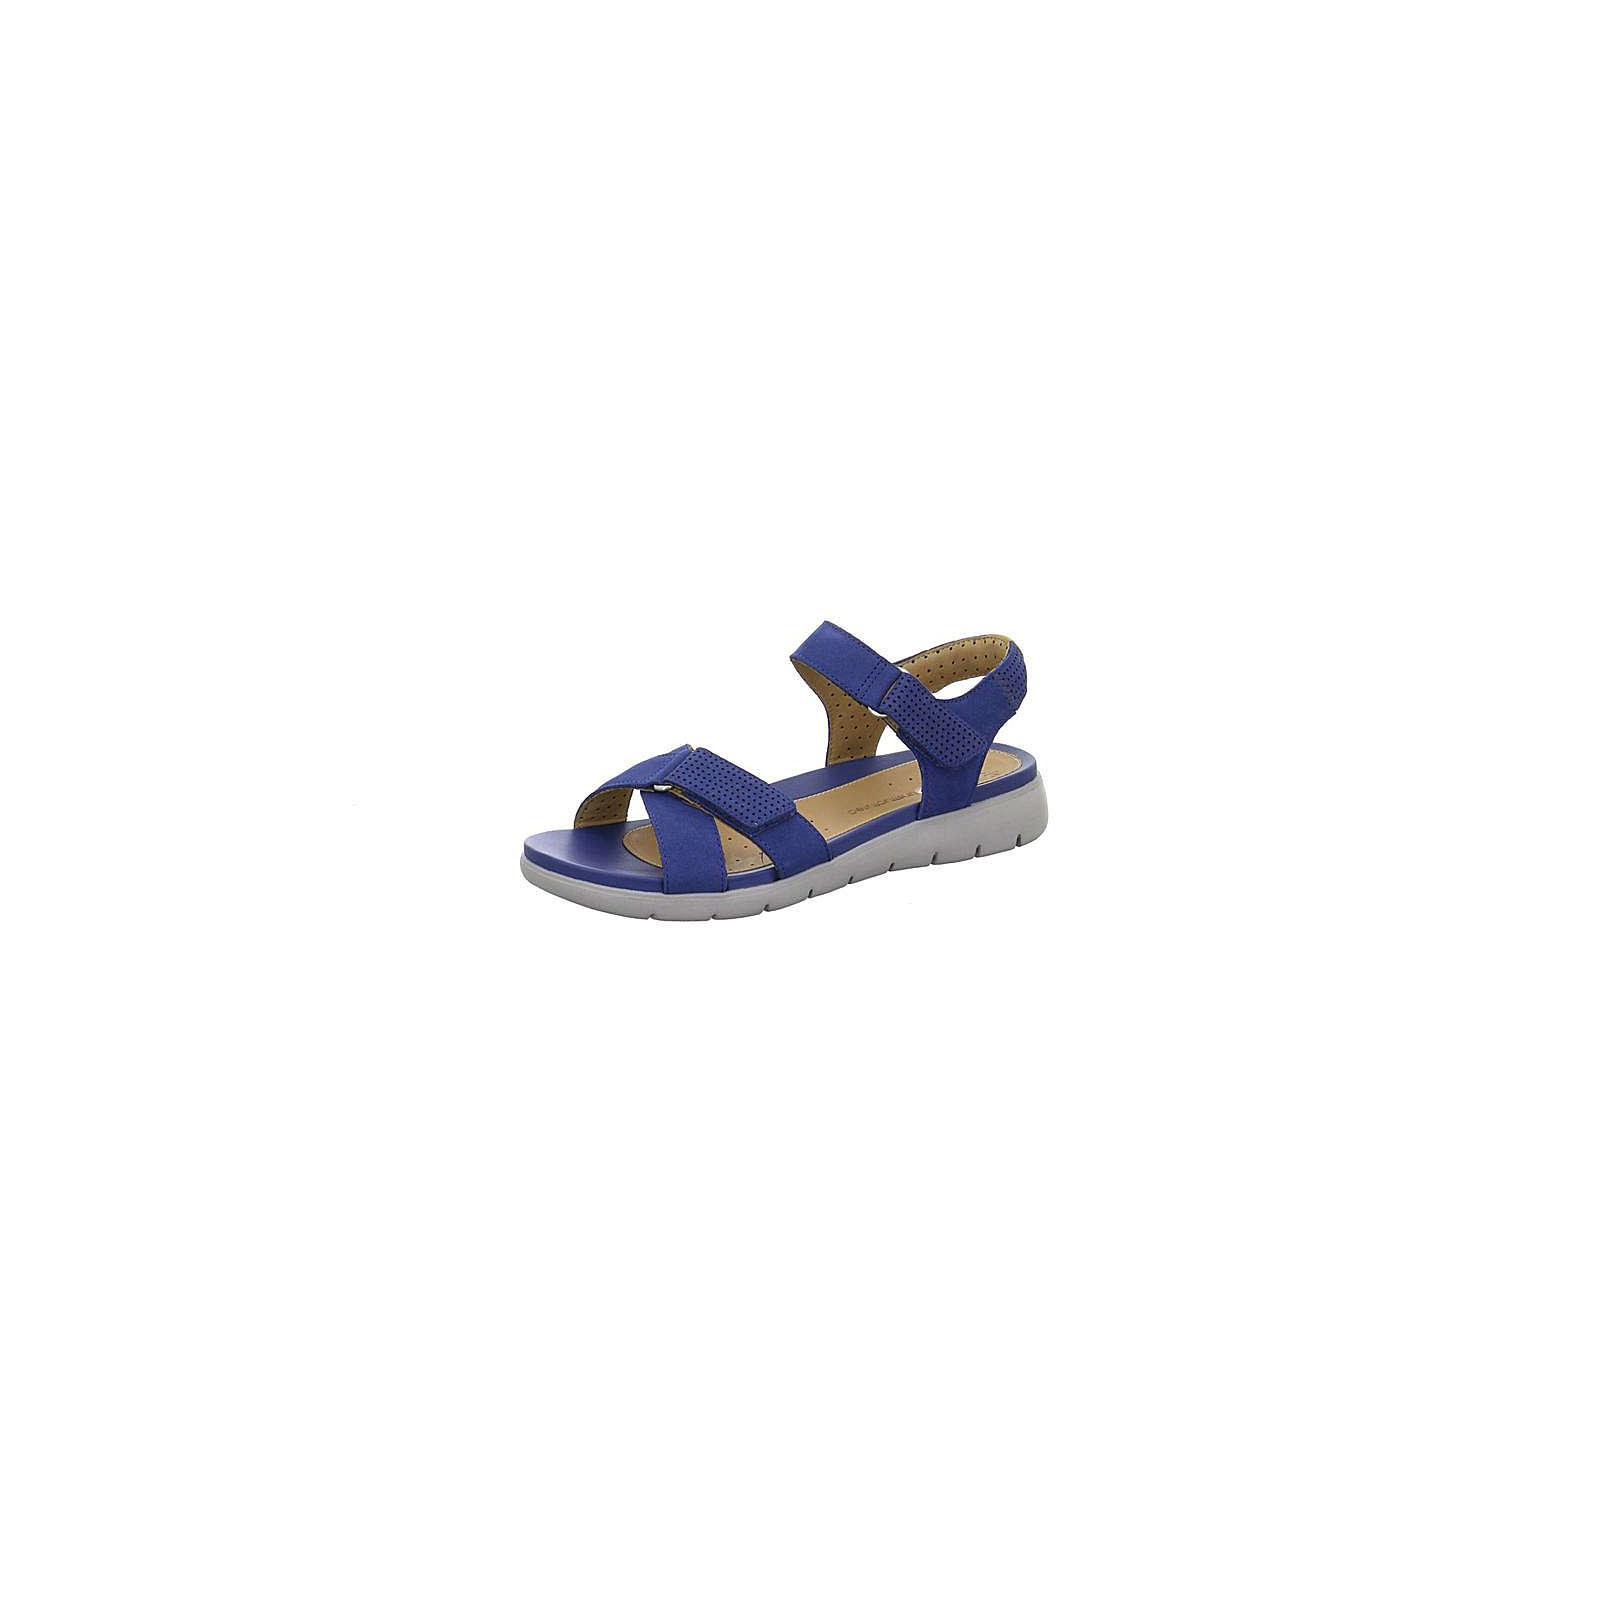 Clarks Komfort-Sandalen blau Damen Gr. 37